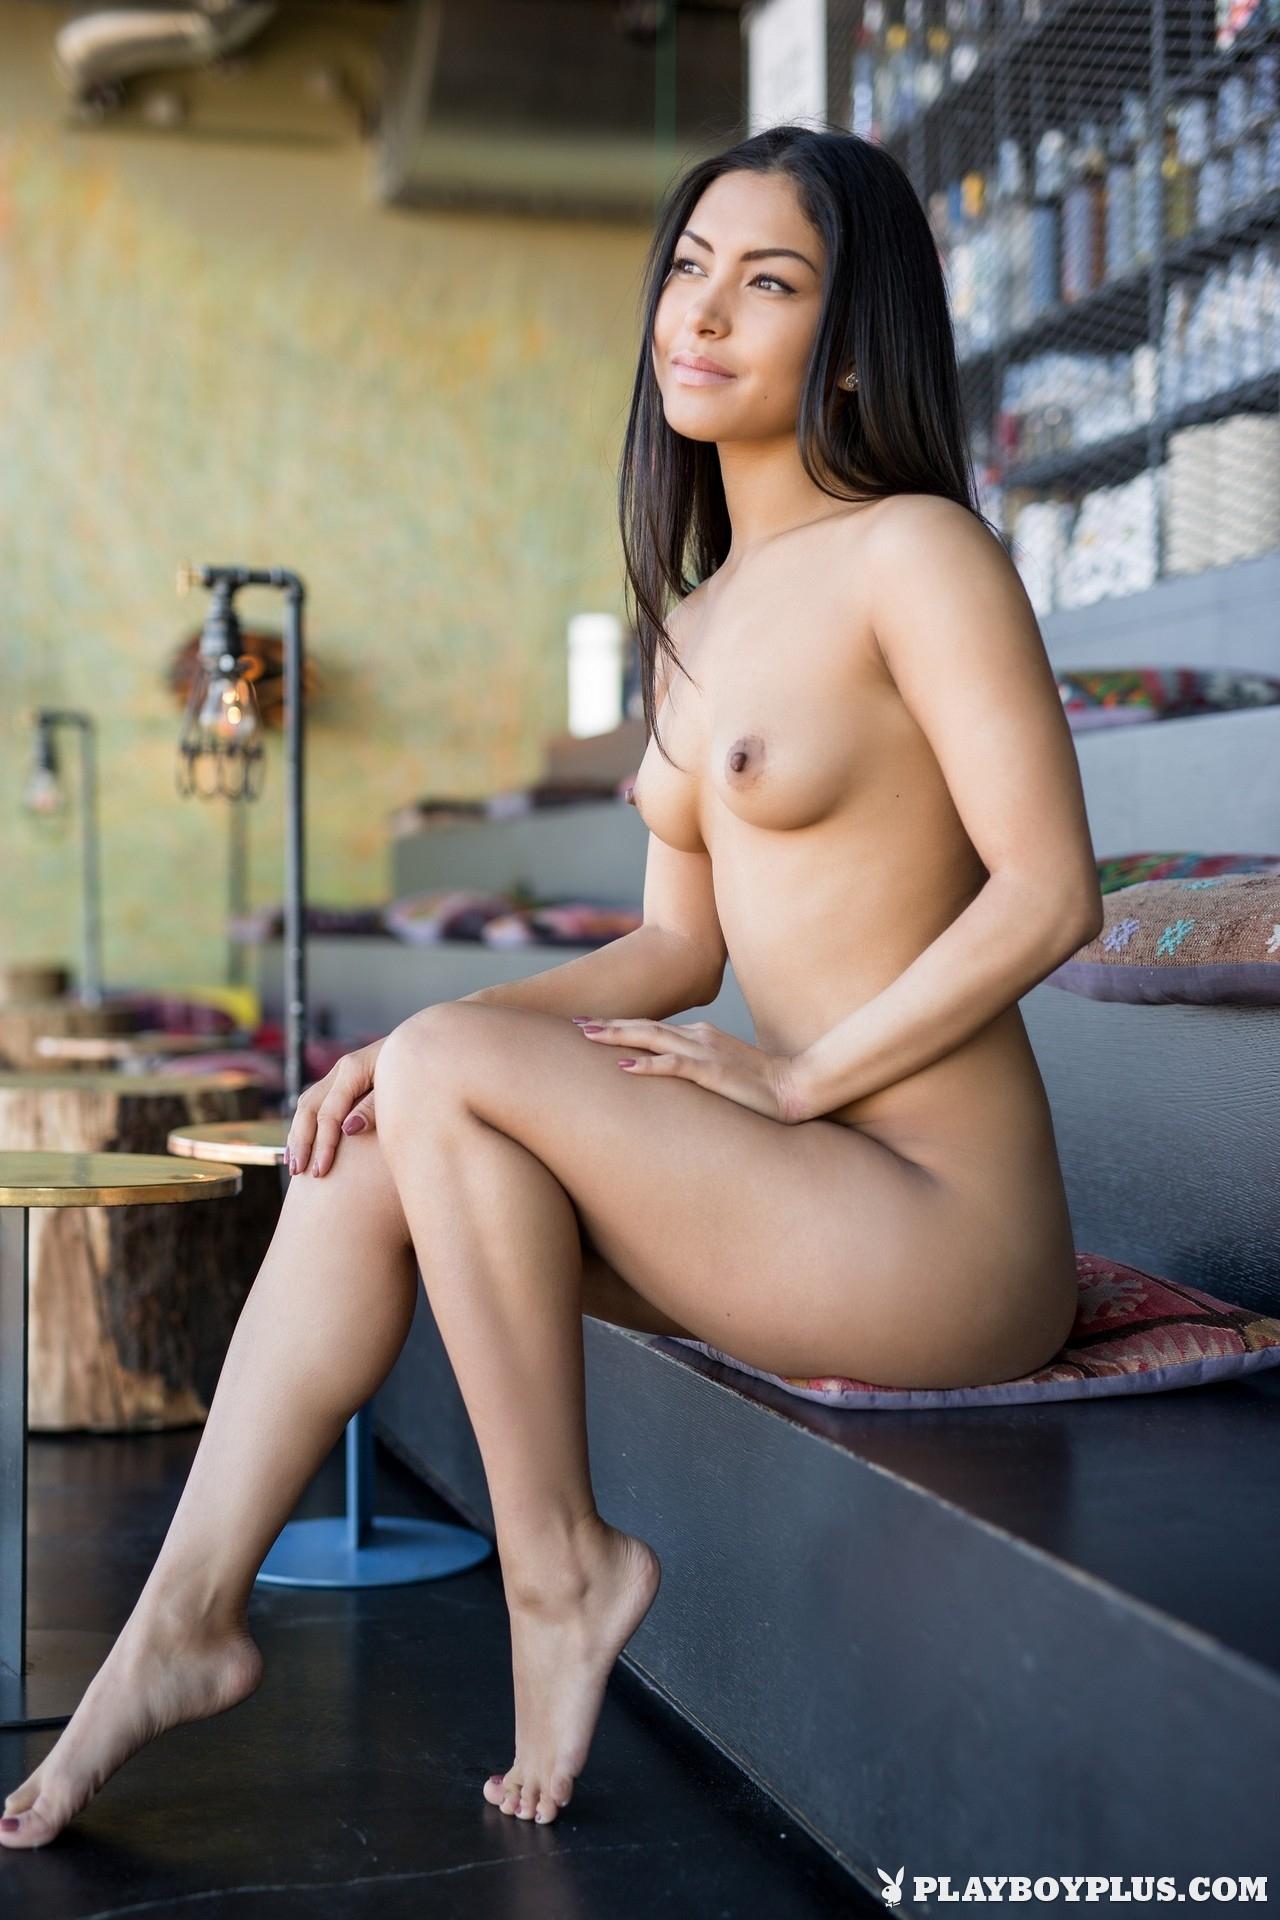 Playboy Plus Chloe Rose In Inspiring View (10)